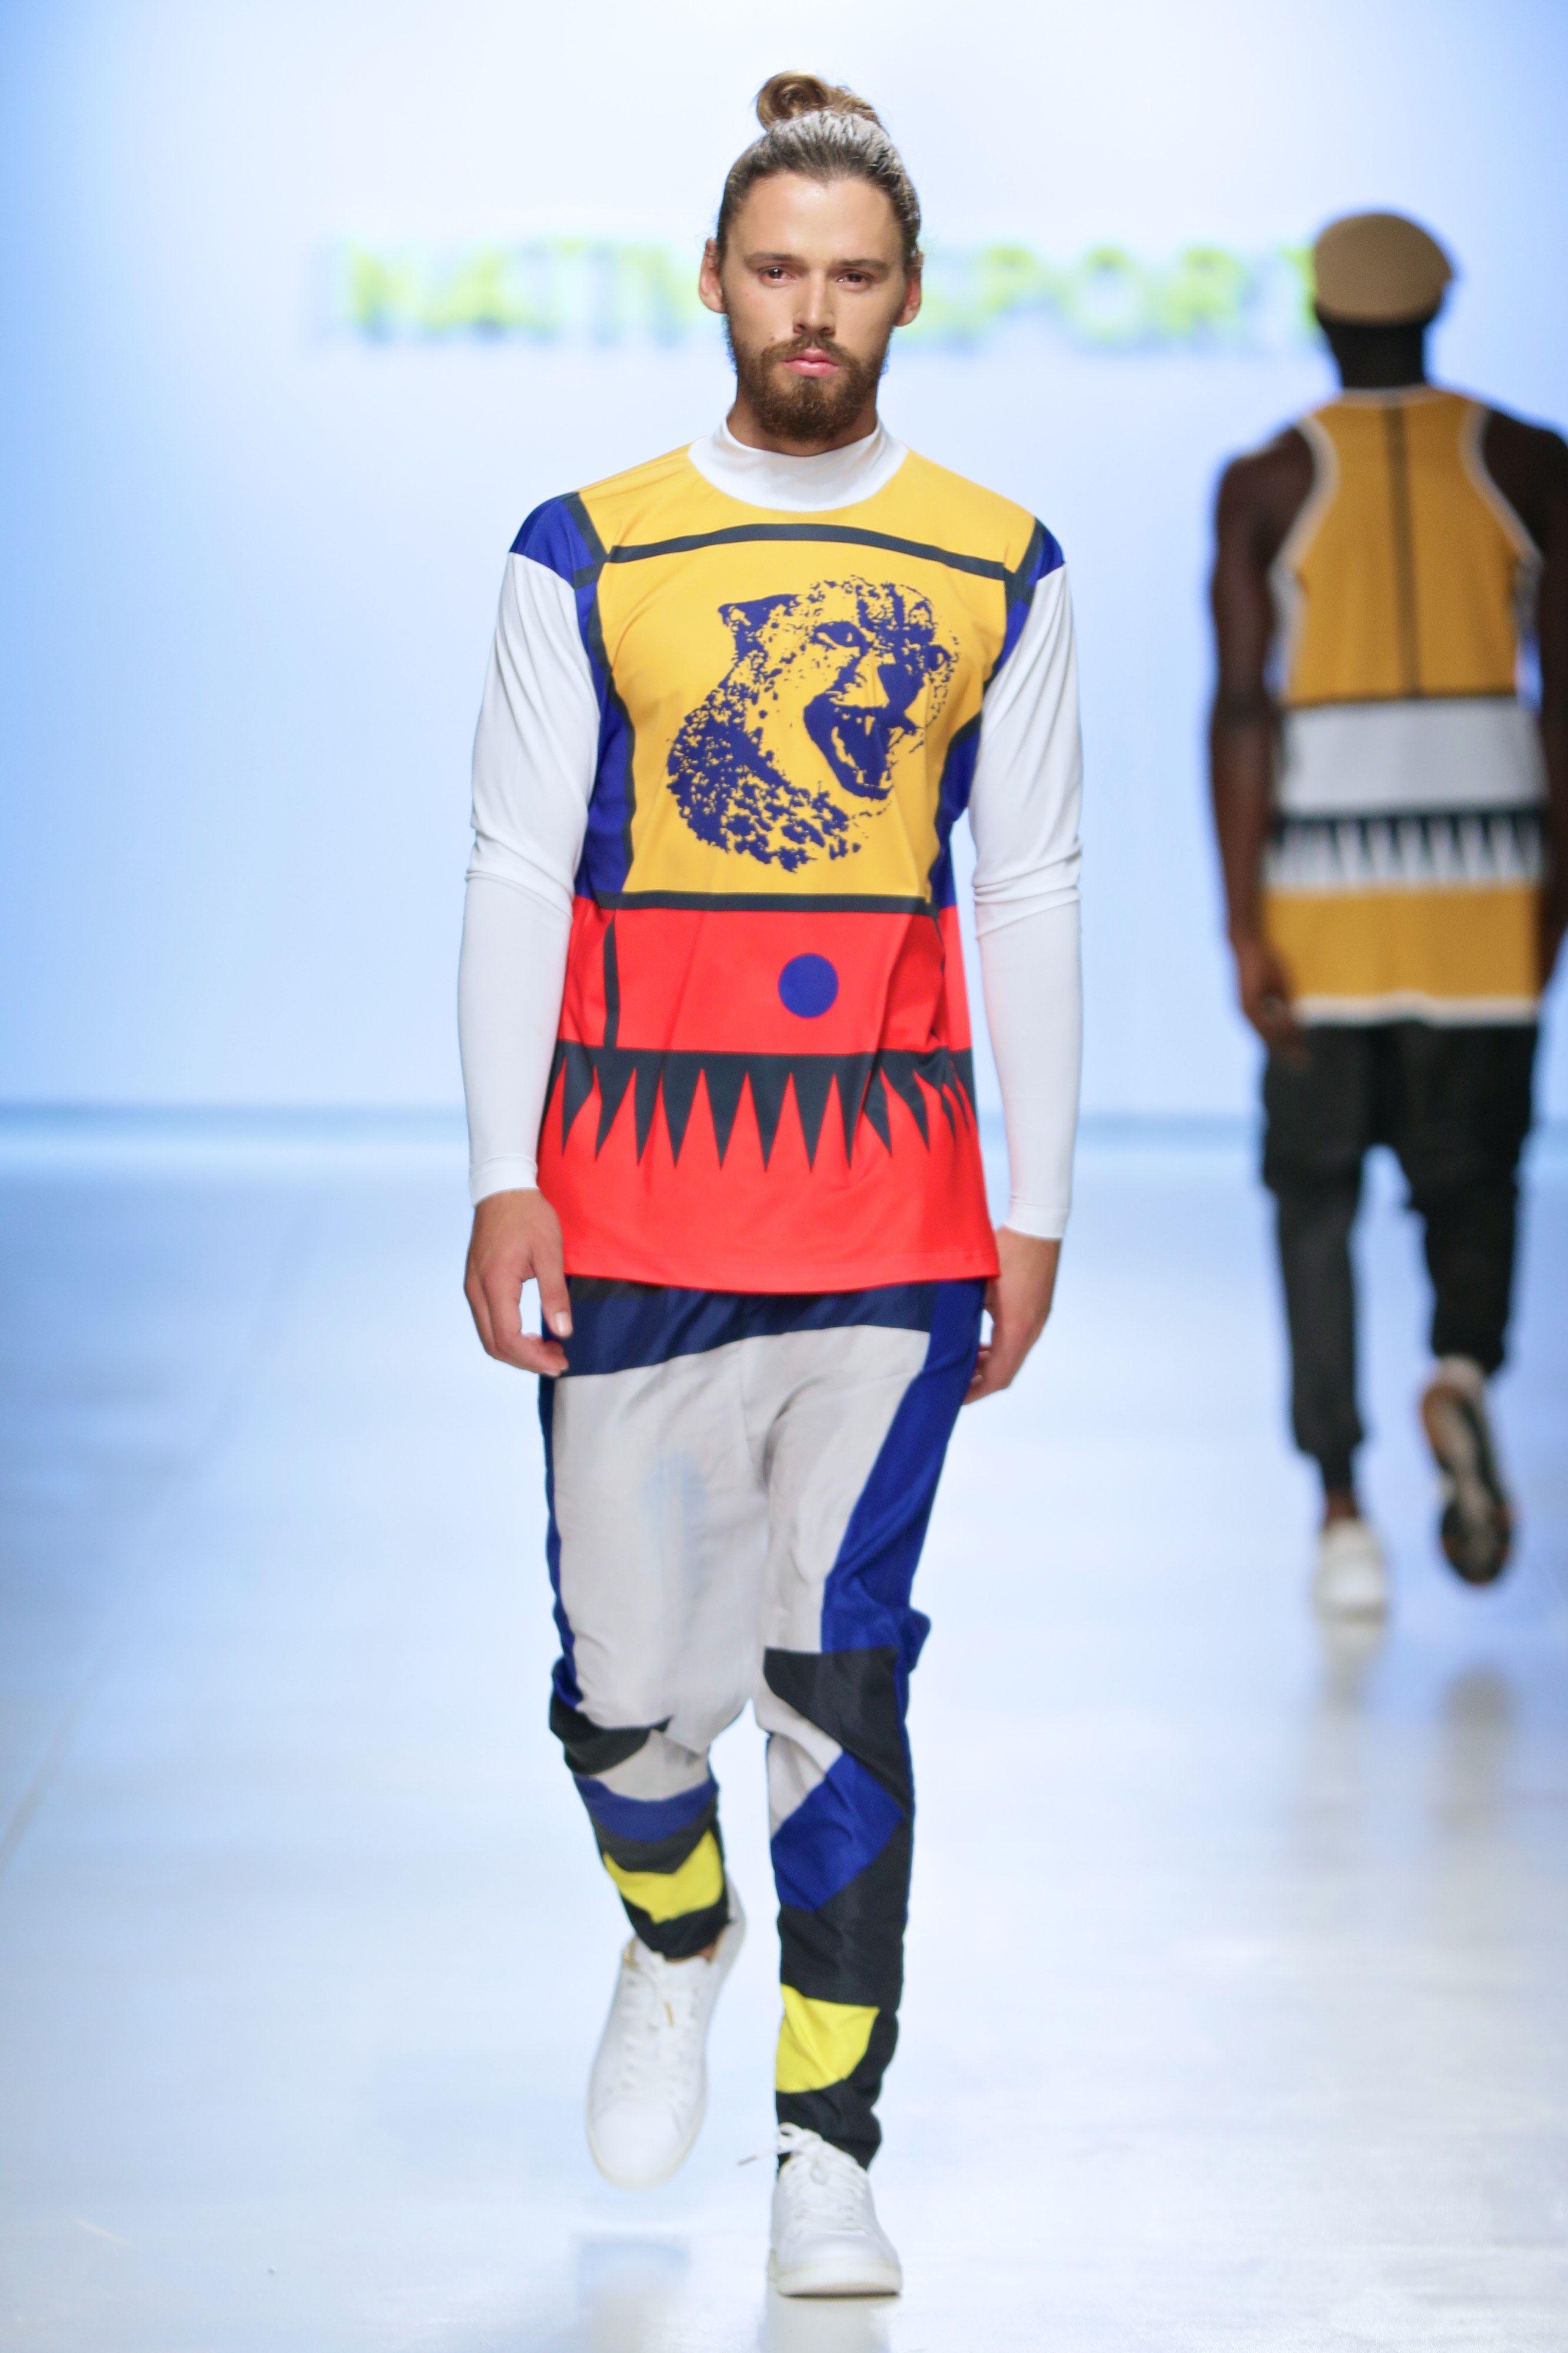 Craig Native Spring Summer 2016 - Mercedes Benz Fashion Week Cape Town - #Menswear #Trends #Tendencias #Moda Hombre